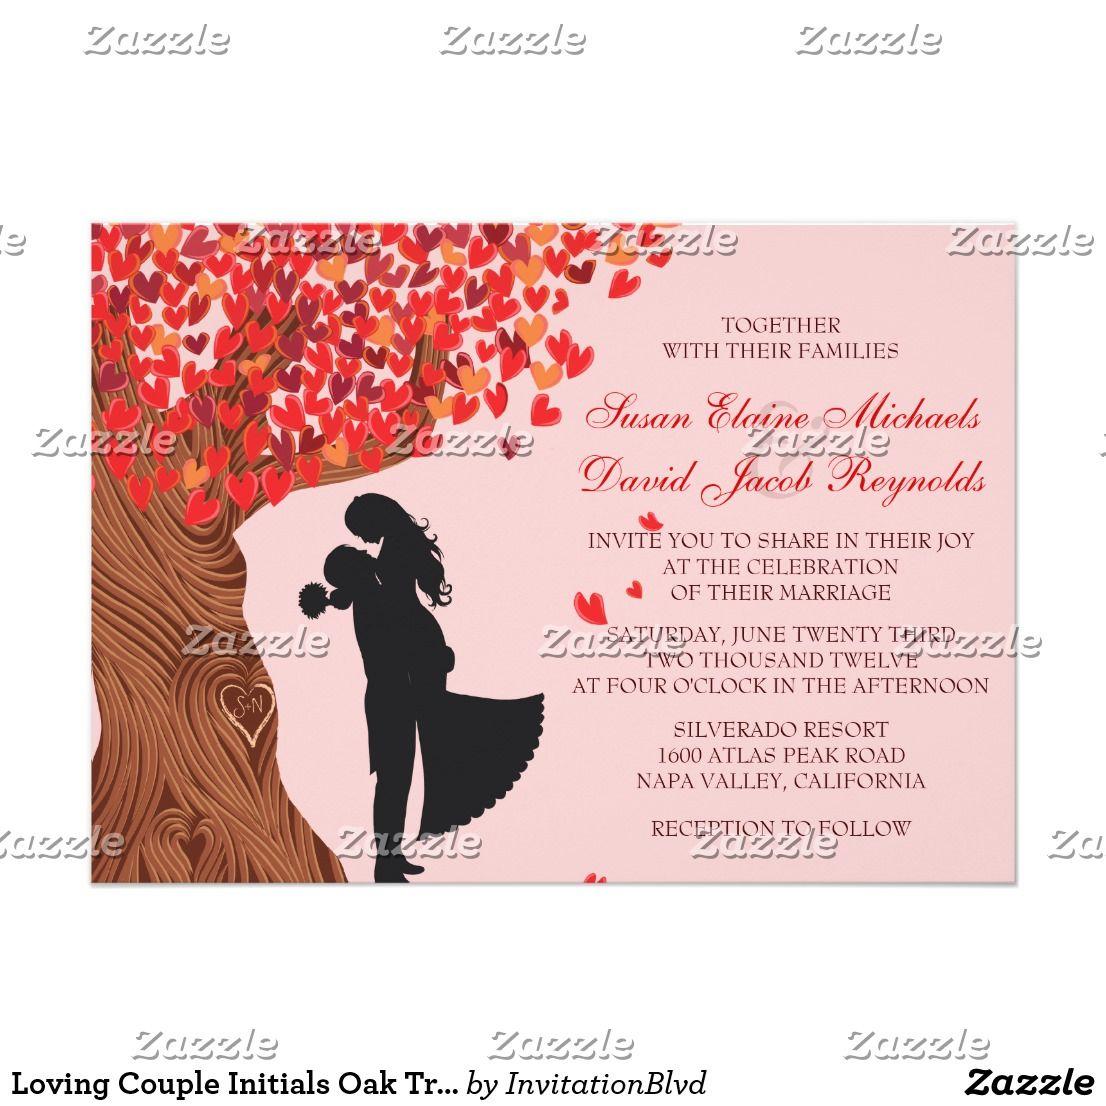 Loving Couple Initials Oak Tree Fall Wedding Invitation | Pinterest ...